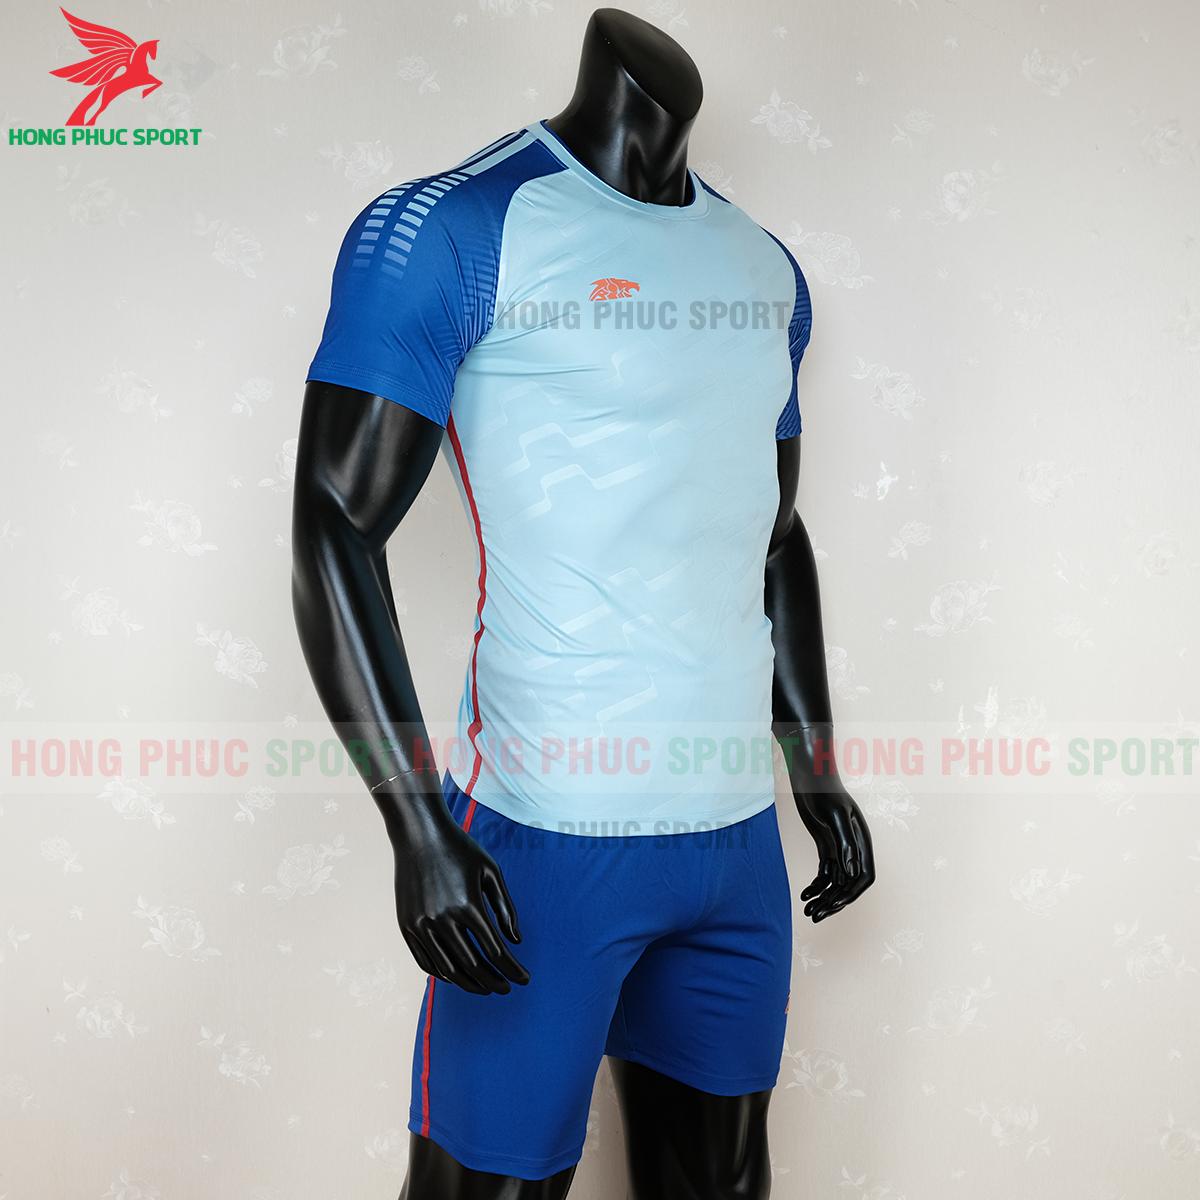 https://cdn.hongphucsport.com/unsafe/s4.shopbay.vn/files/285/ao-bong-da-riki-quator-xanh-nhat-1-5f71b38e11cc8.png